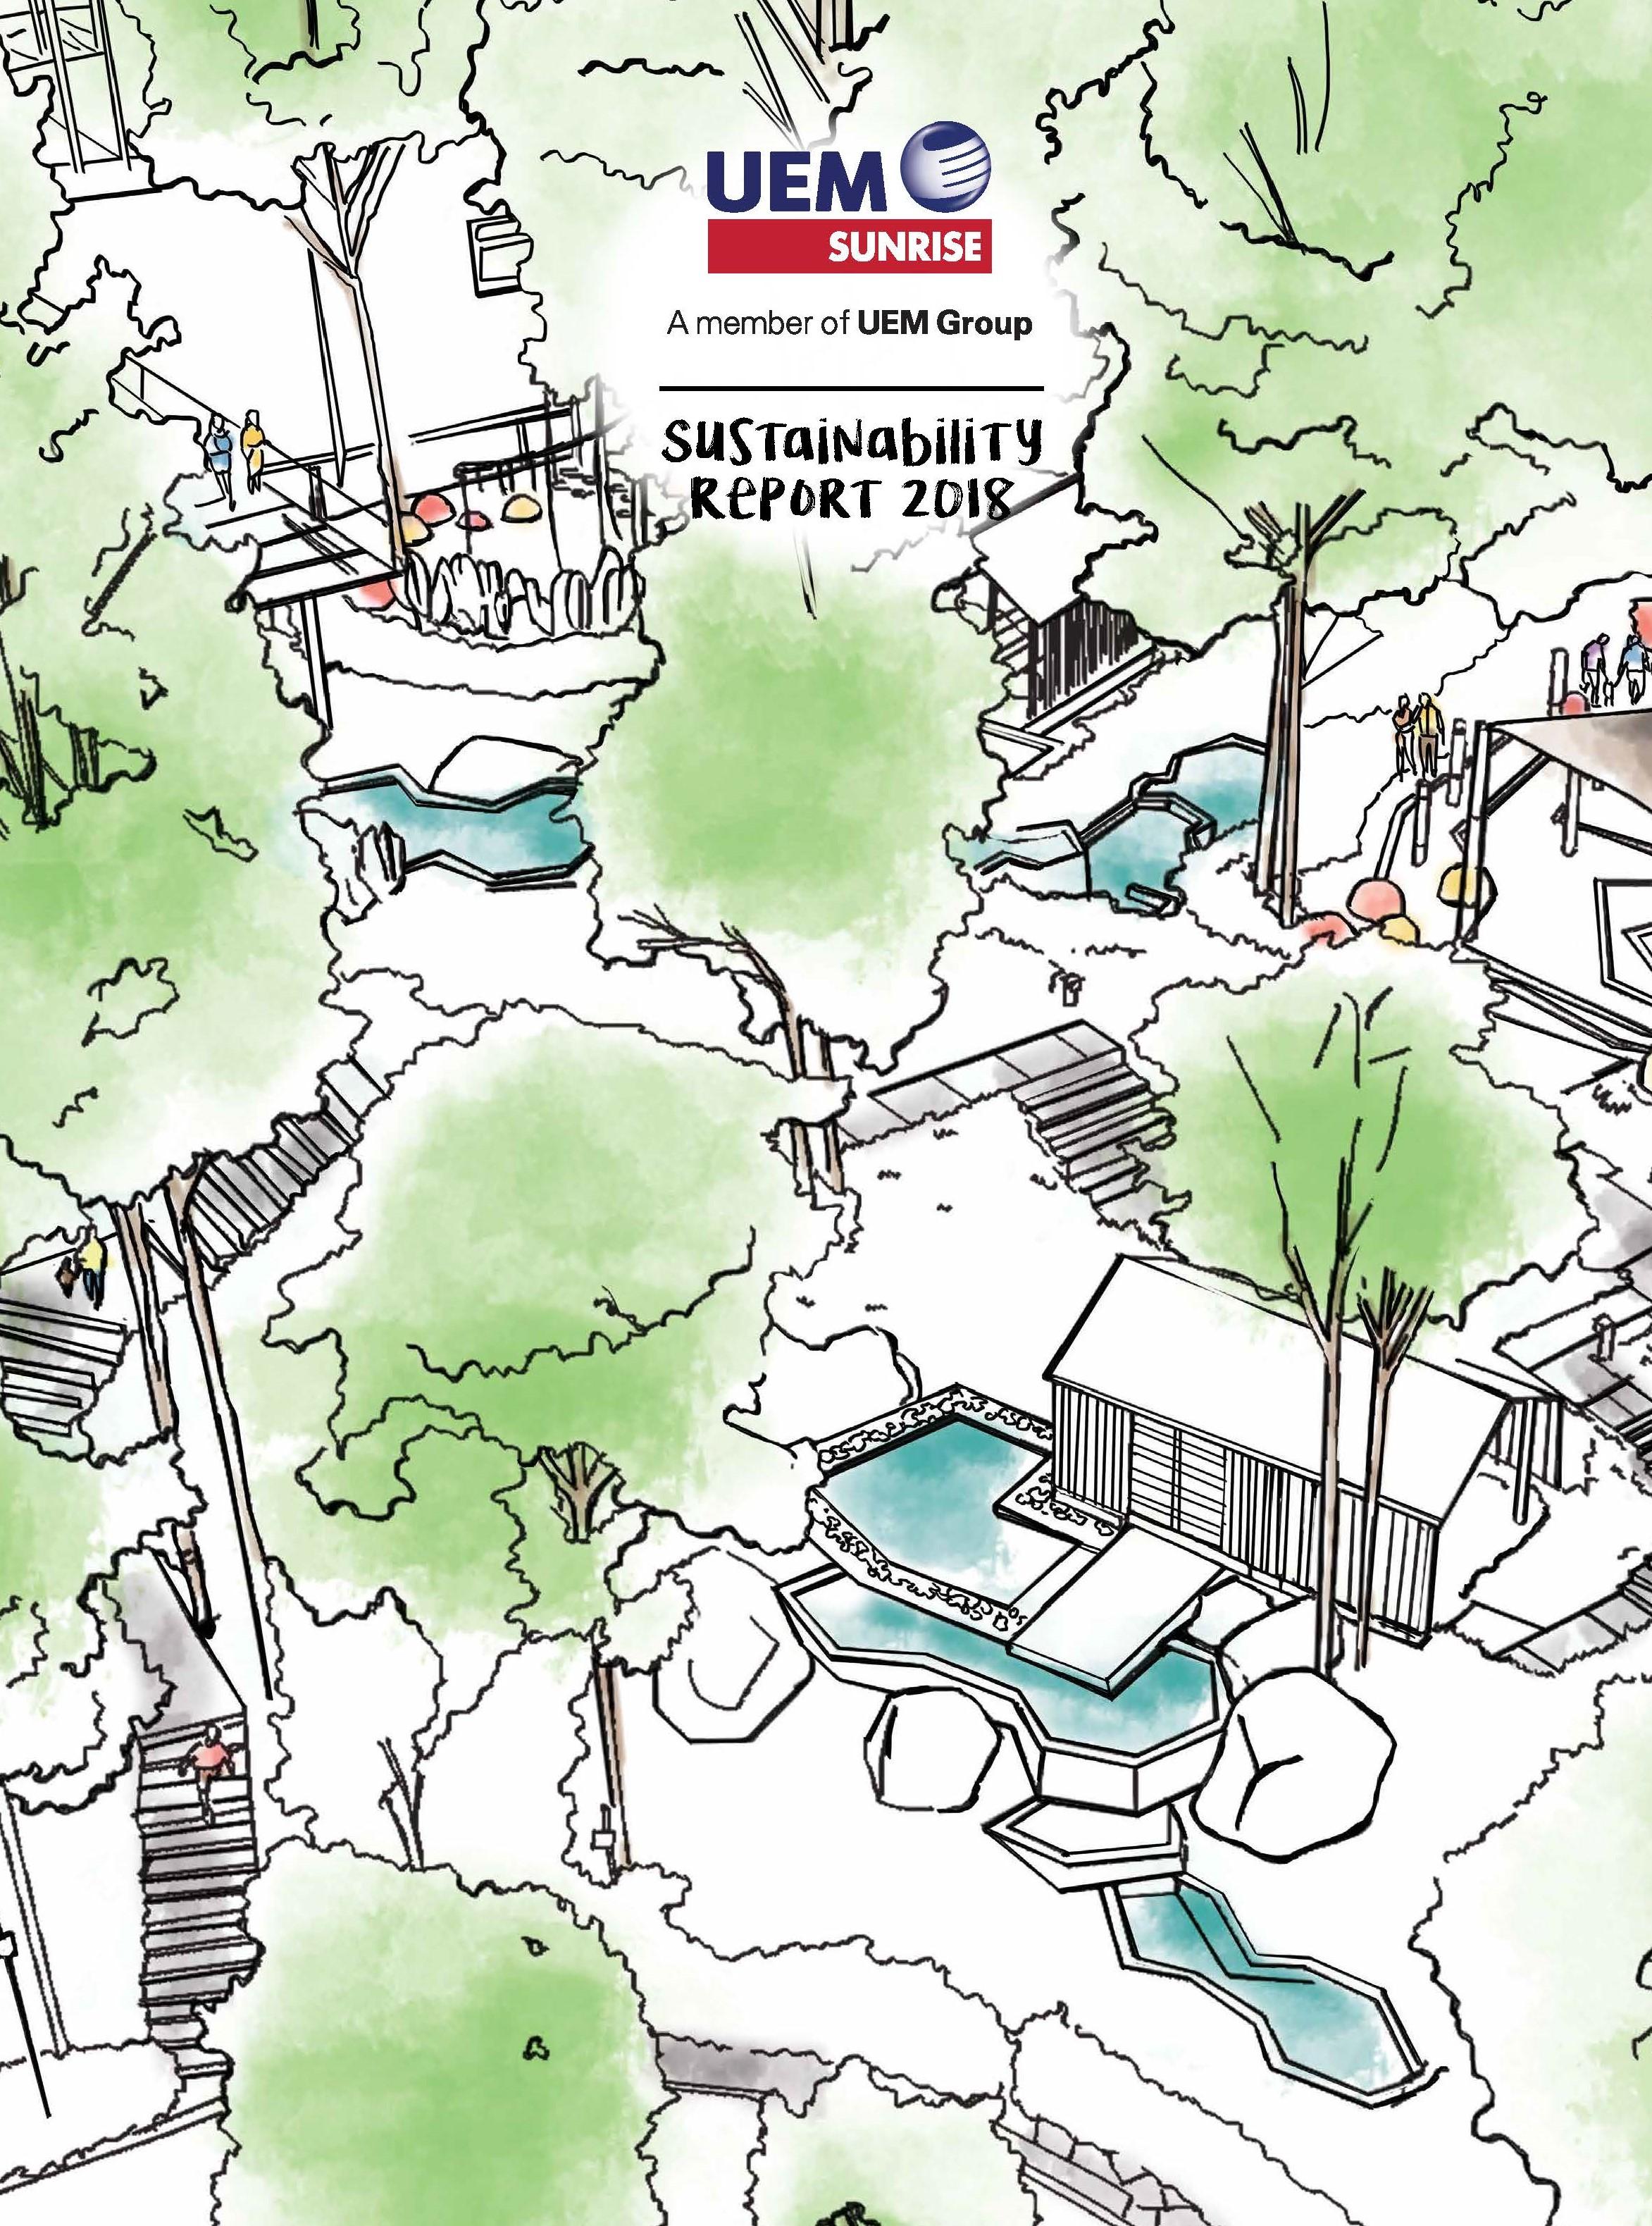 UEM Sunrise Sustainability Report 2018